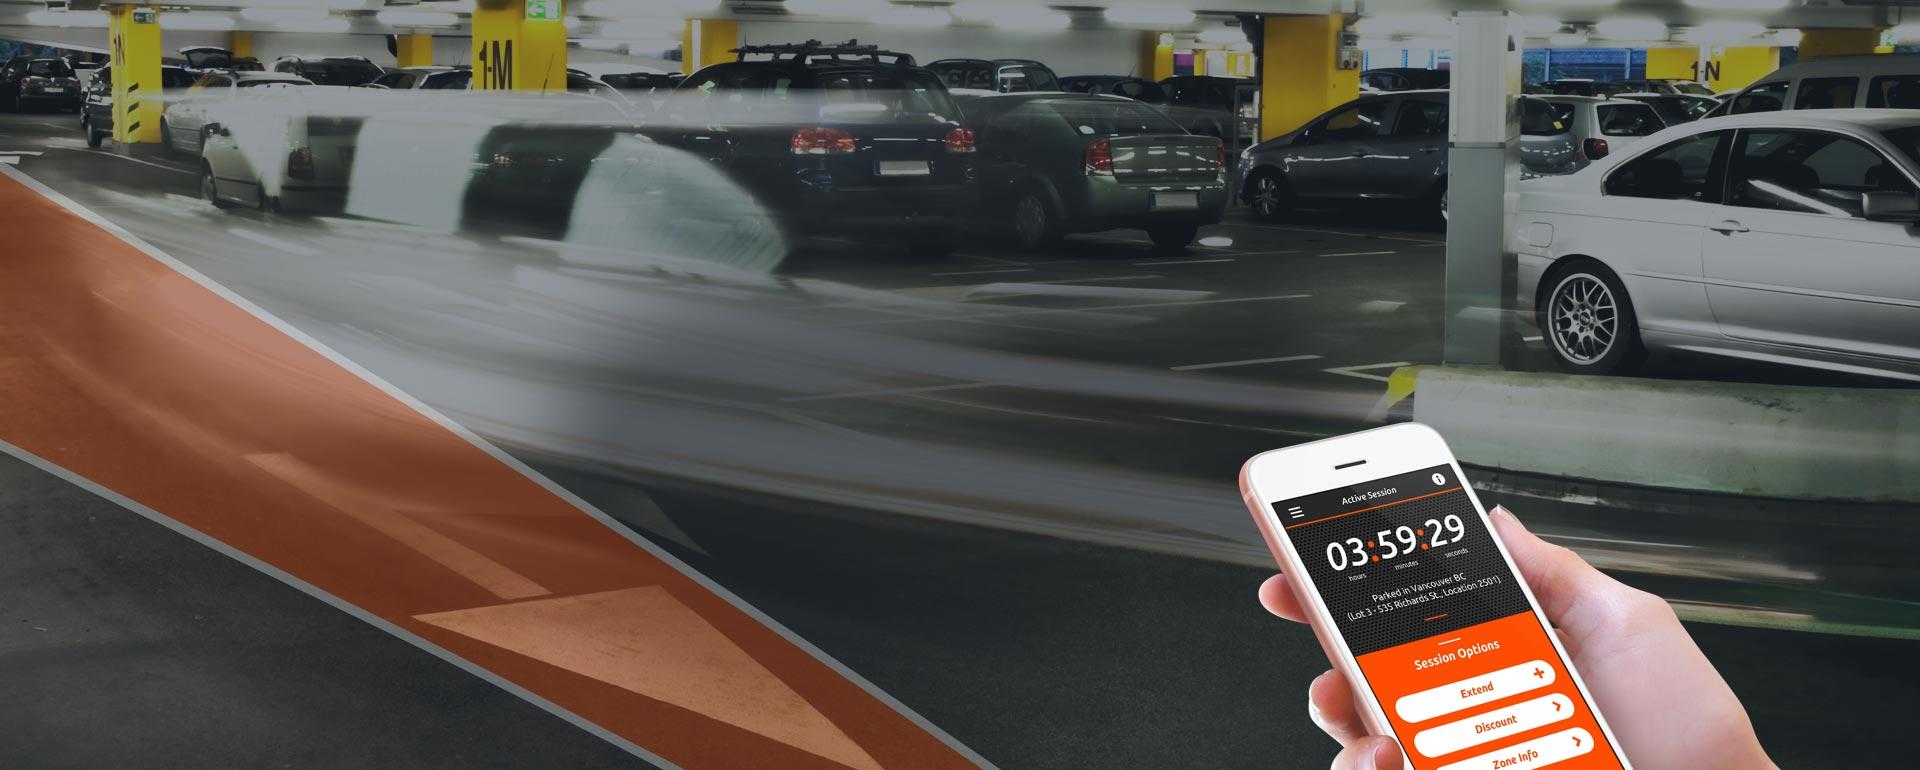 Easypark Mobile Parking App